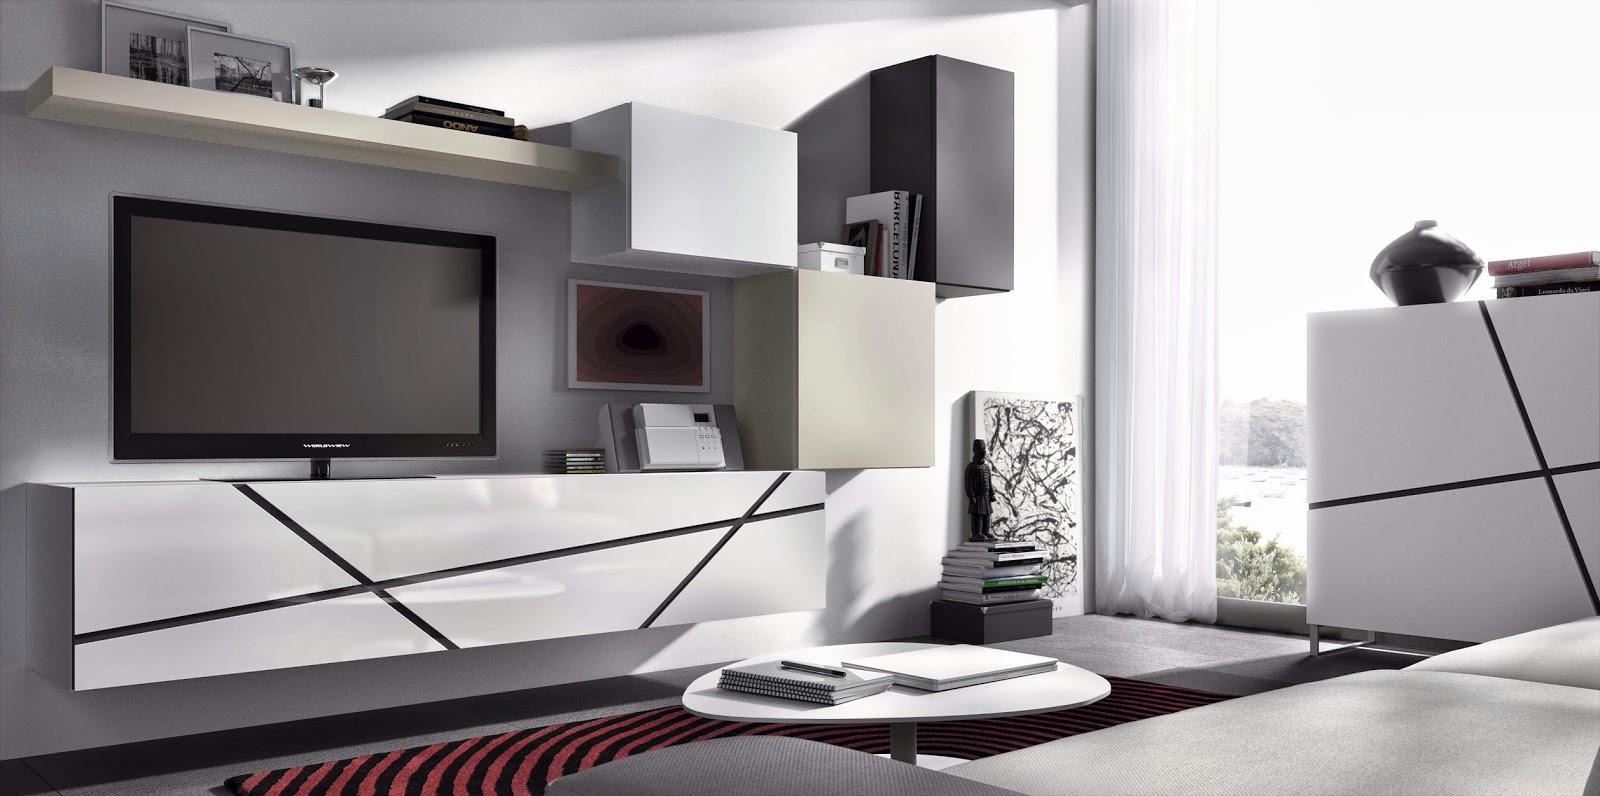 Informaci n de mobiliario opini n de producto colecci n for Mueble salon minimalista